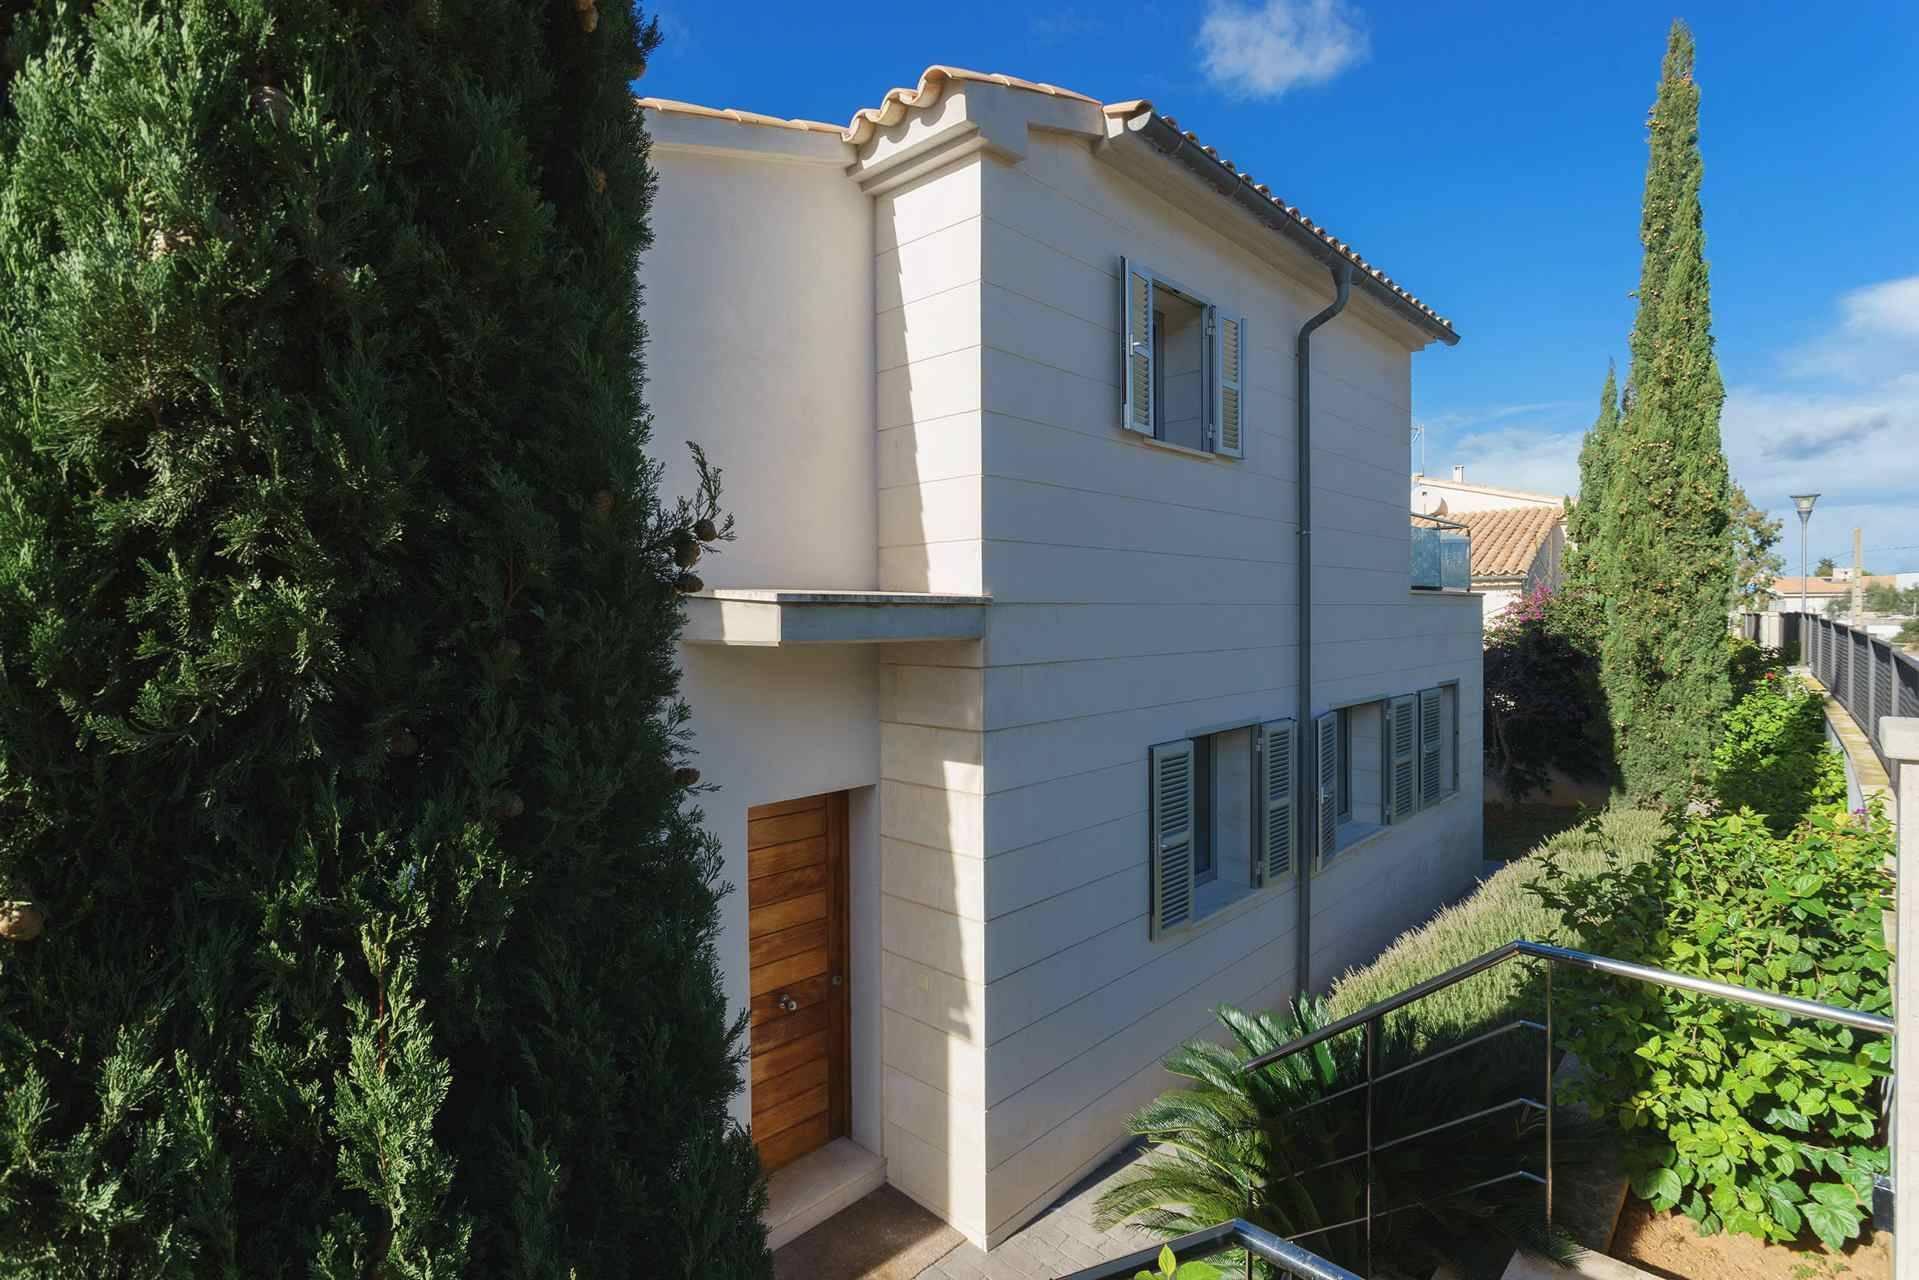 01-282 Ferienhaus Mallorca Norden Meerblick Bild 6